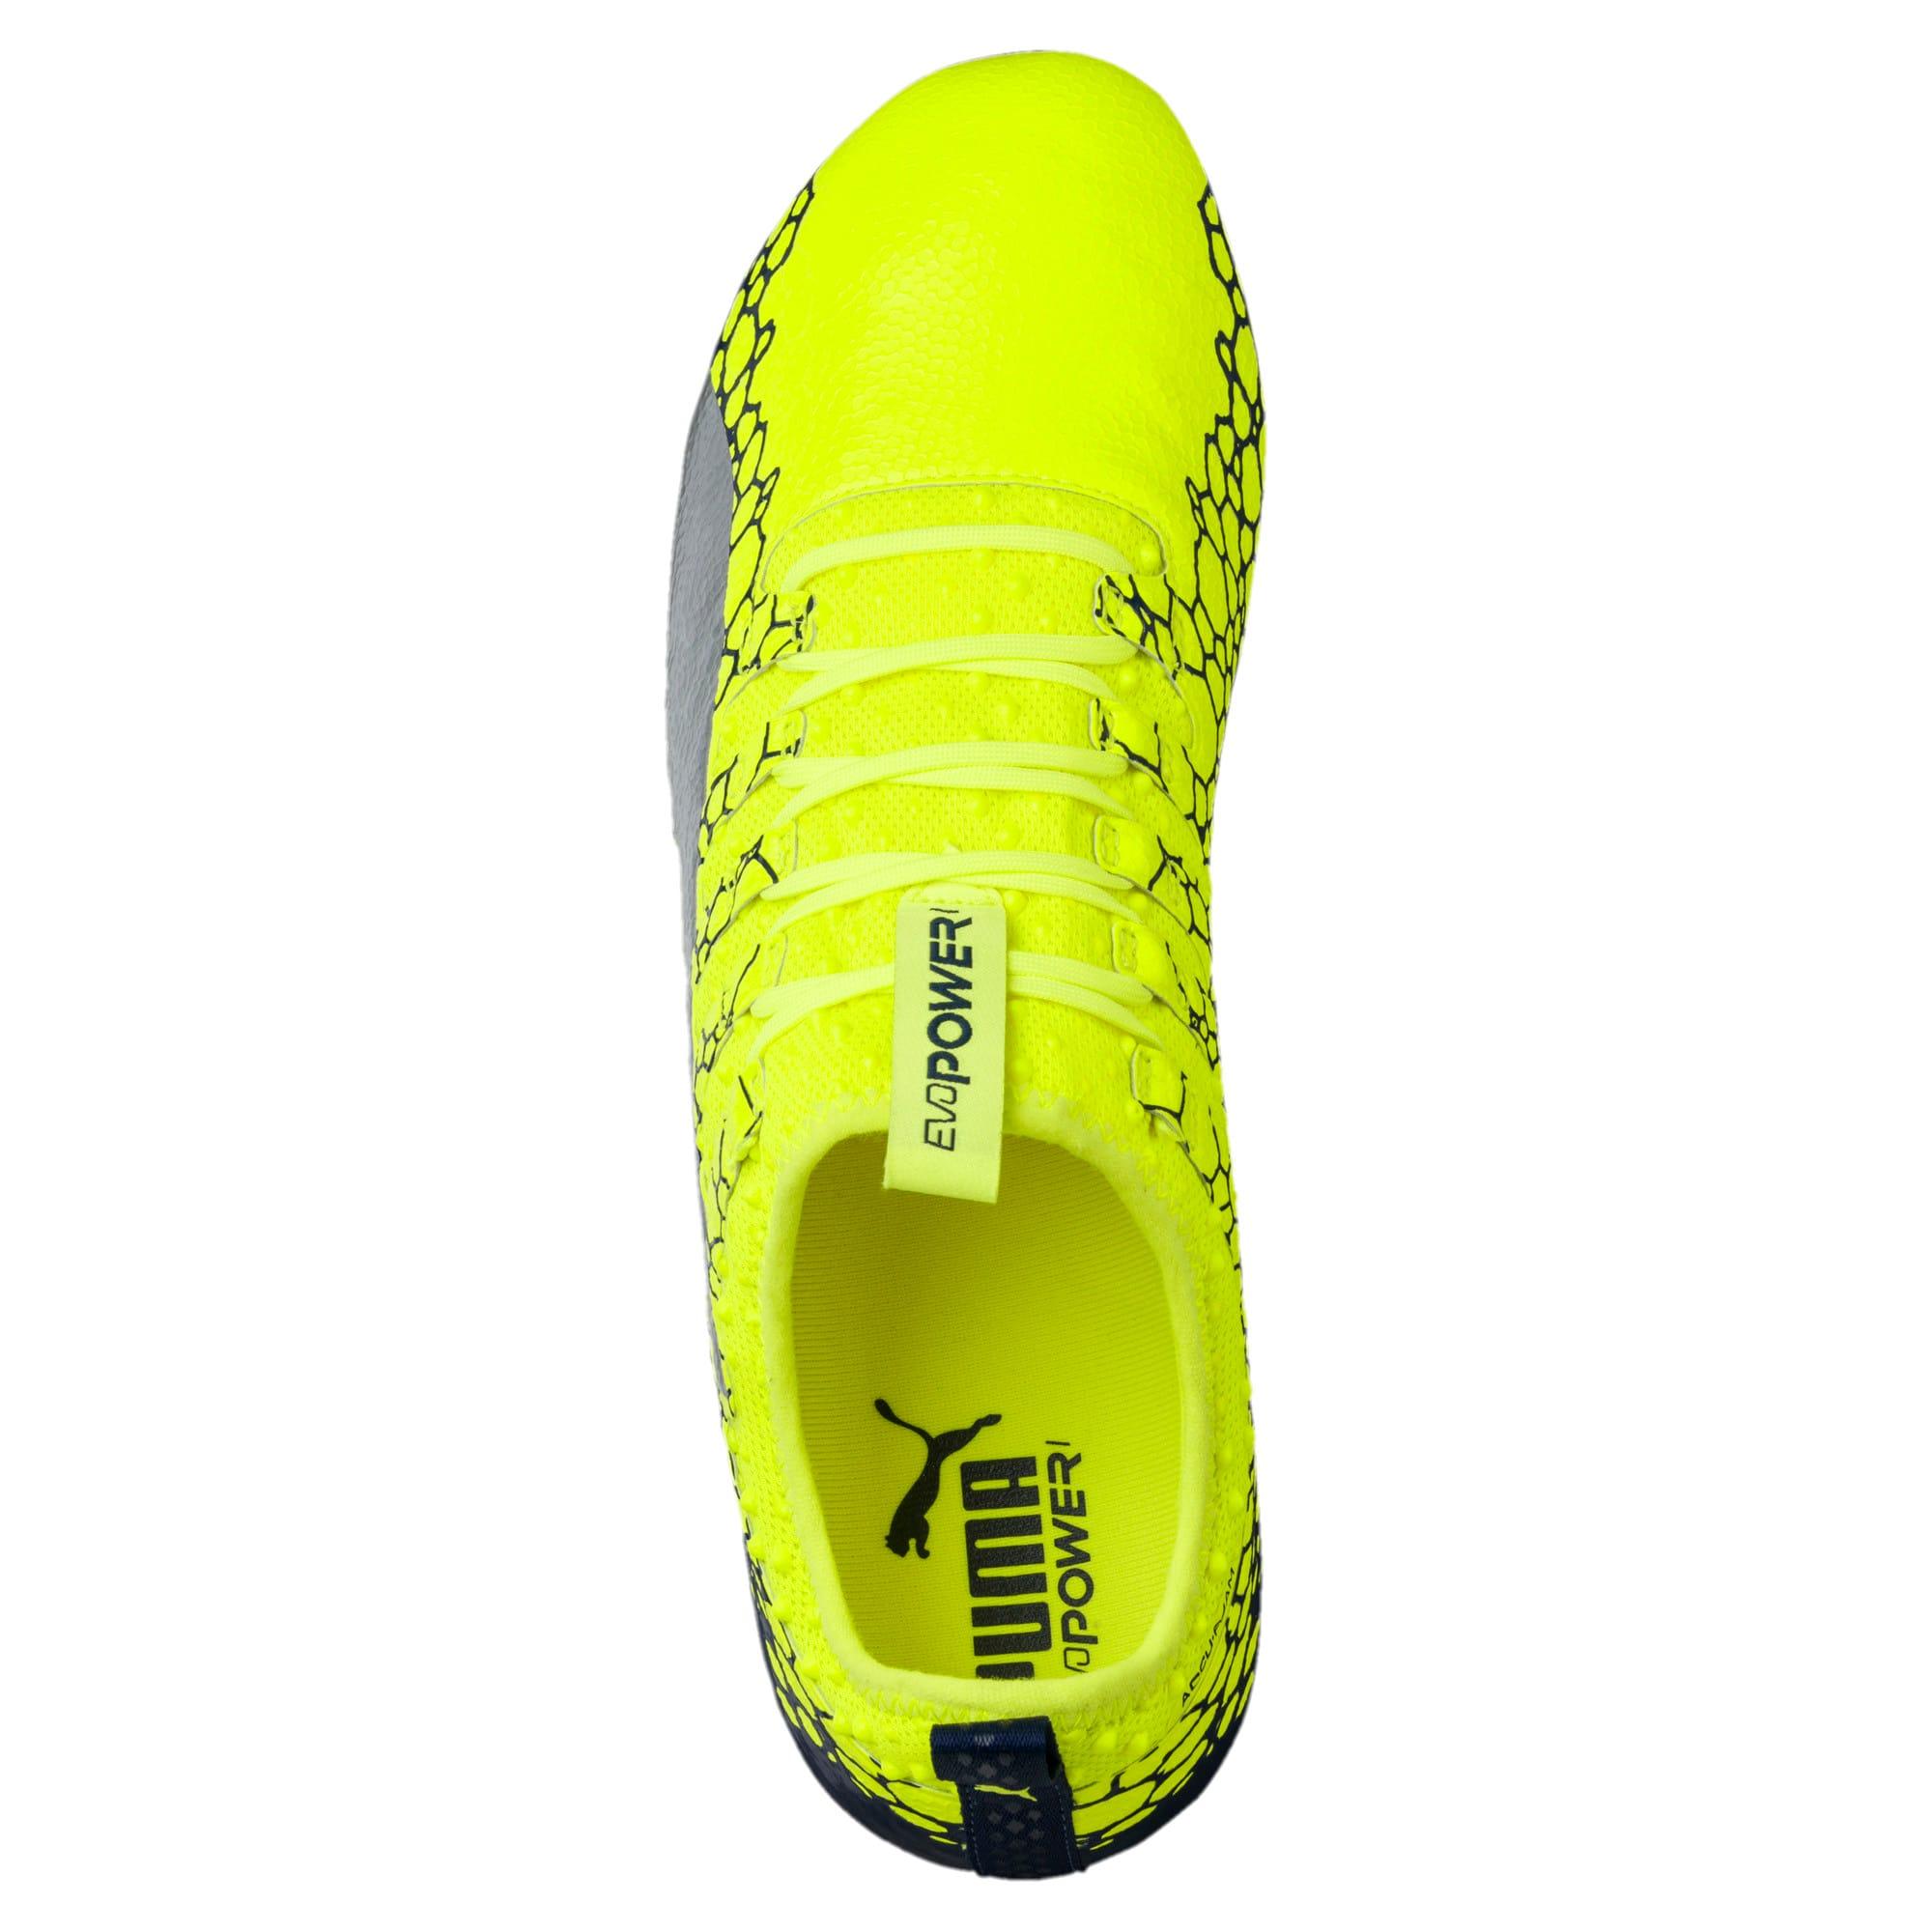 Thumbnail 5 of evoPOWER Vigor 1 Graphic FG Men's Firm Ground Soccer Cleats, Yellow-Silver-Blue, medium